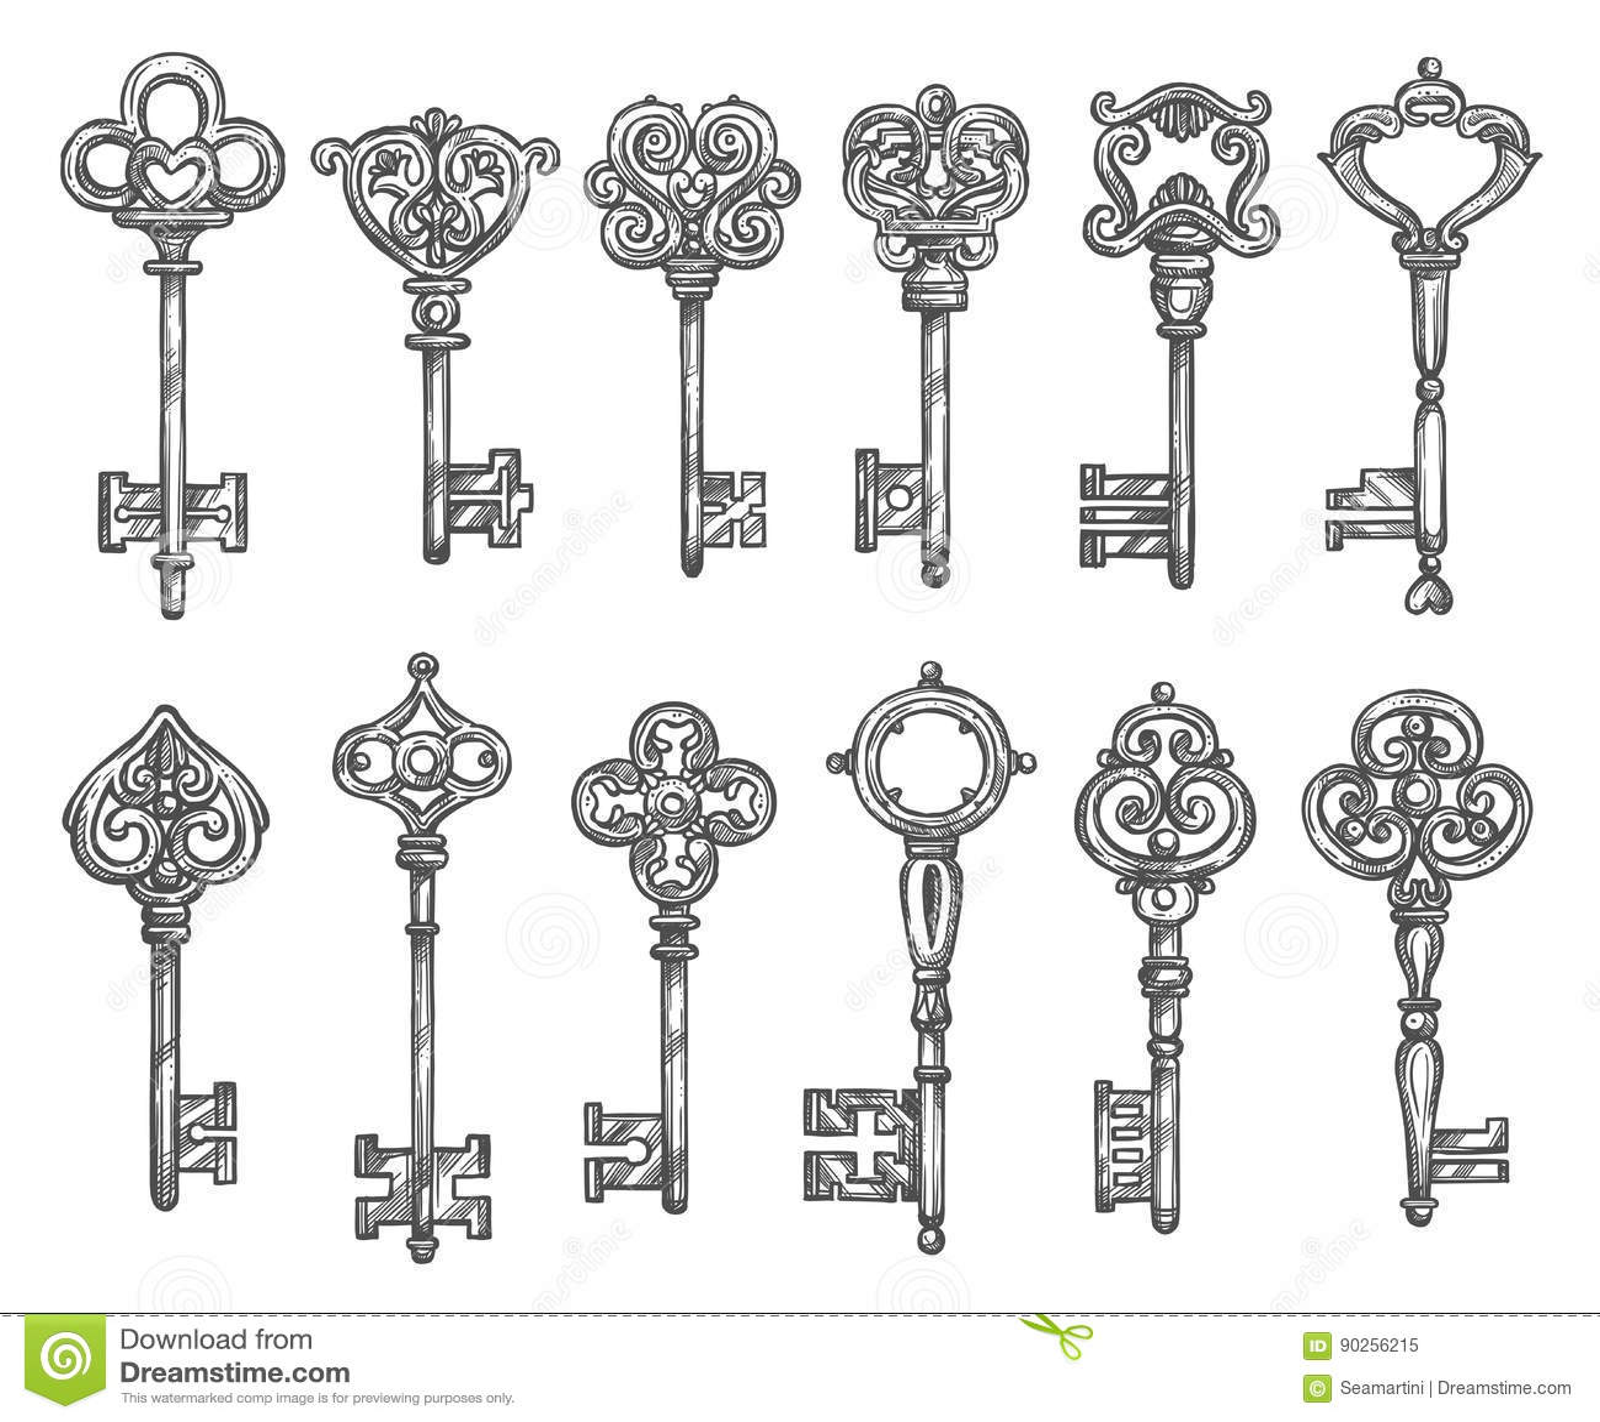 vintage skeleton key drawing sketch coloring page